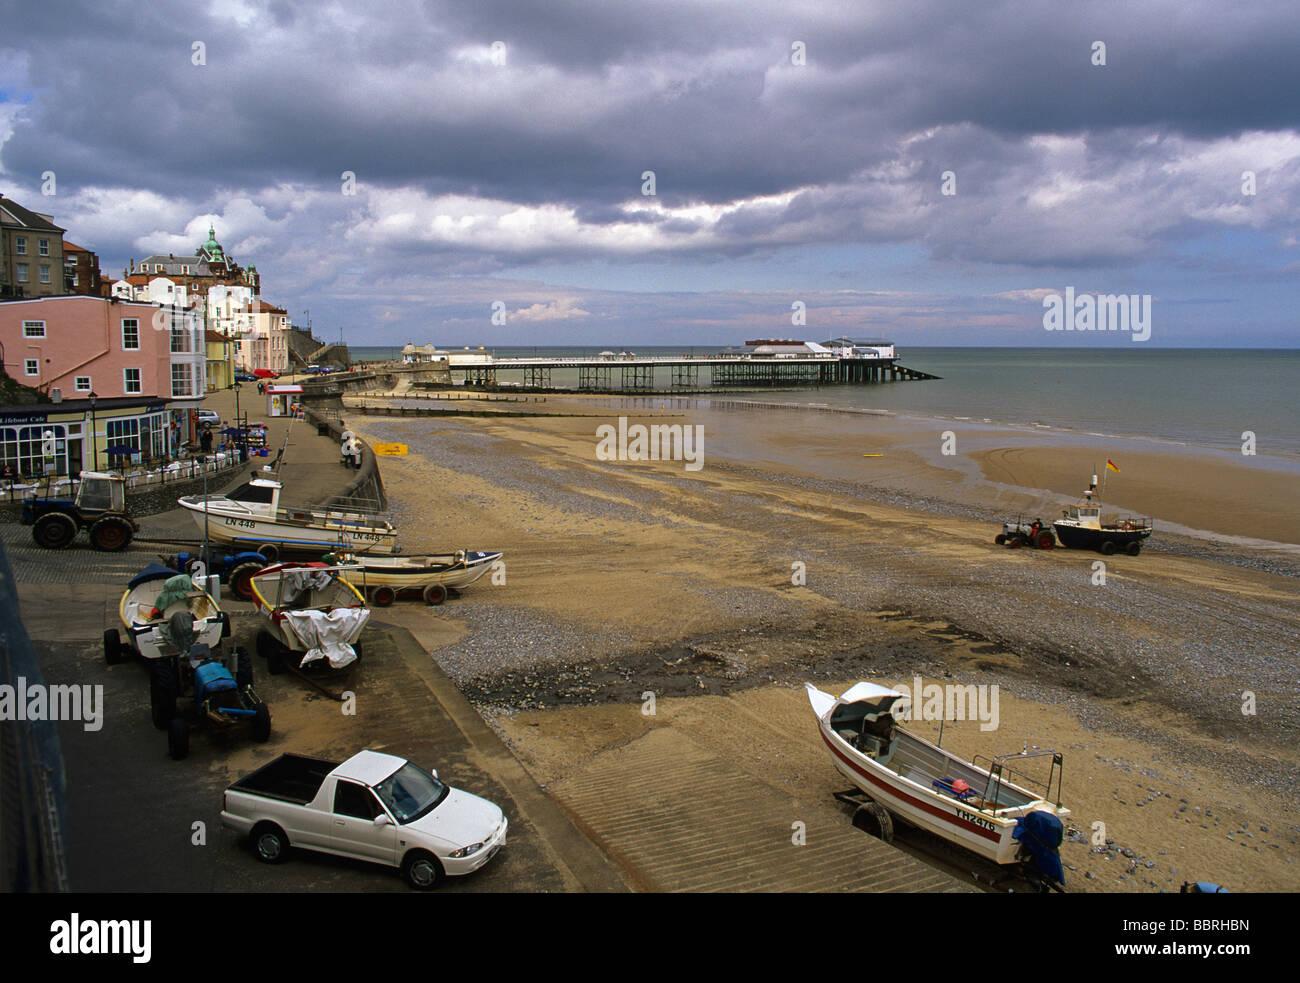 Bord de bateaux salon Crabe Cromer Photo Stock